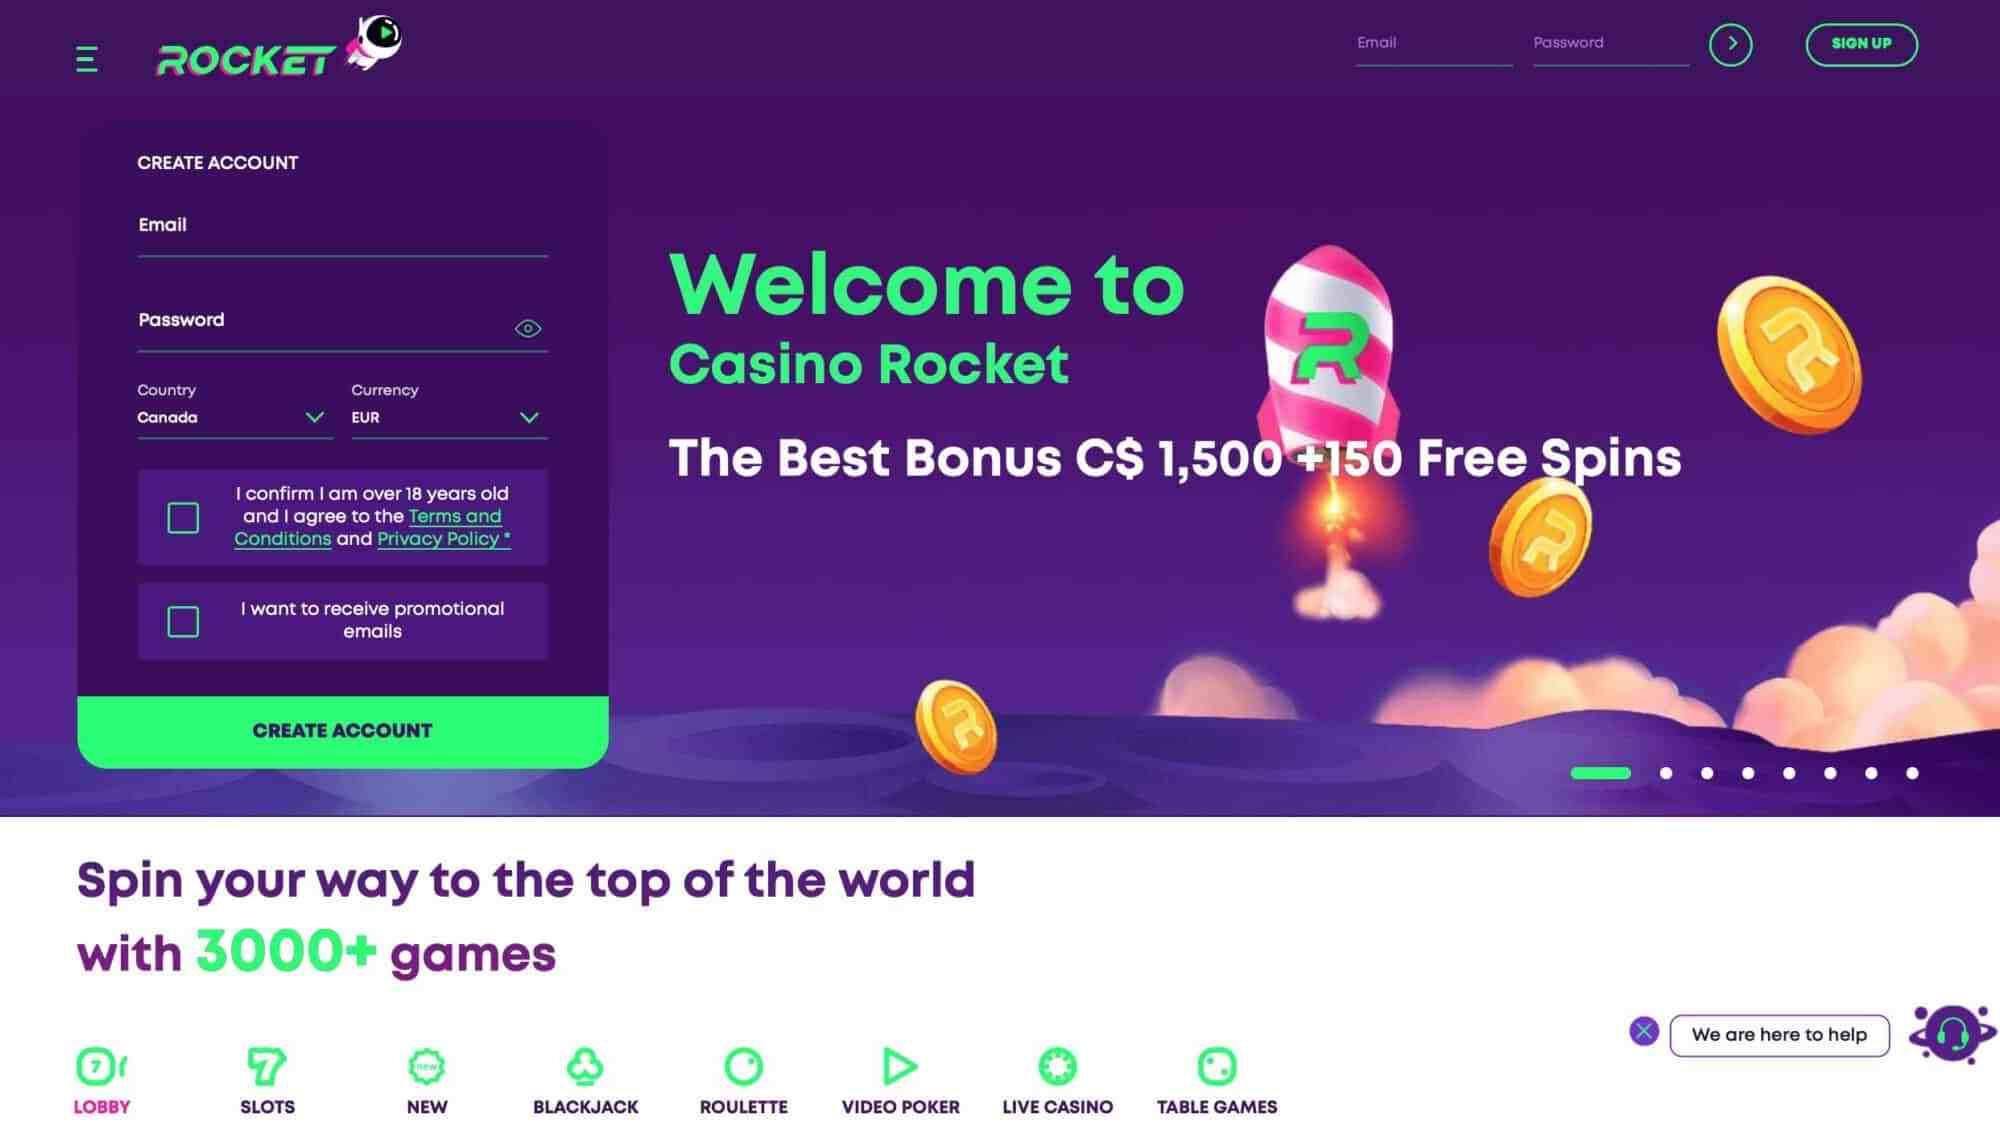 Casino Rocket - Get $1500 Deposit Bonus + 150 Free Spins